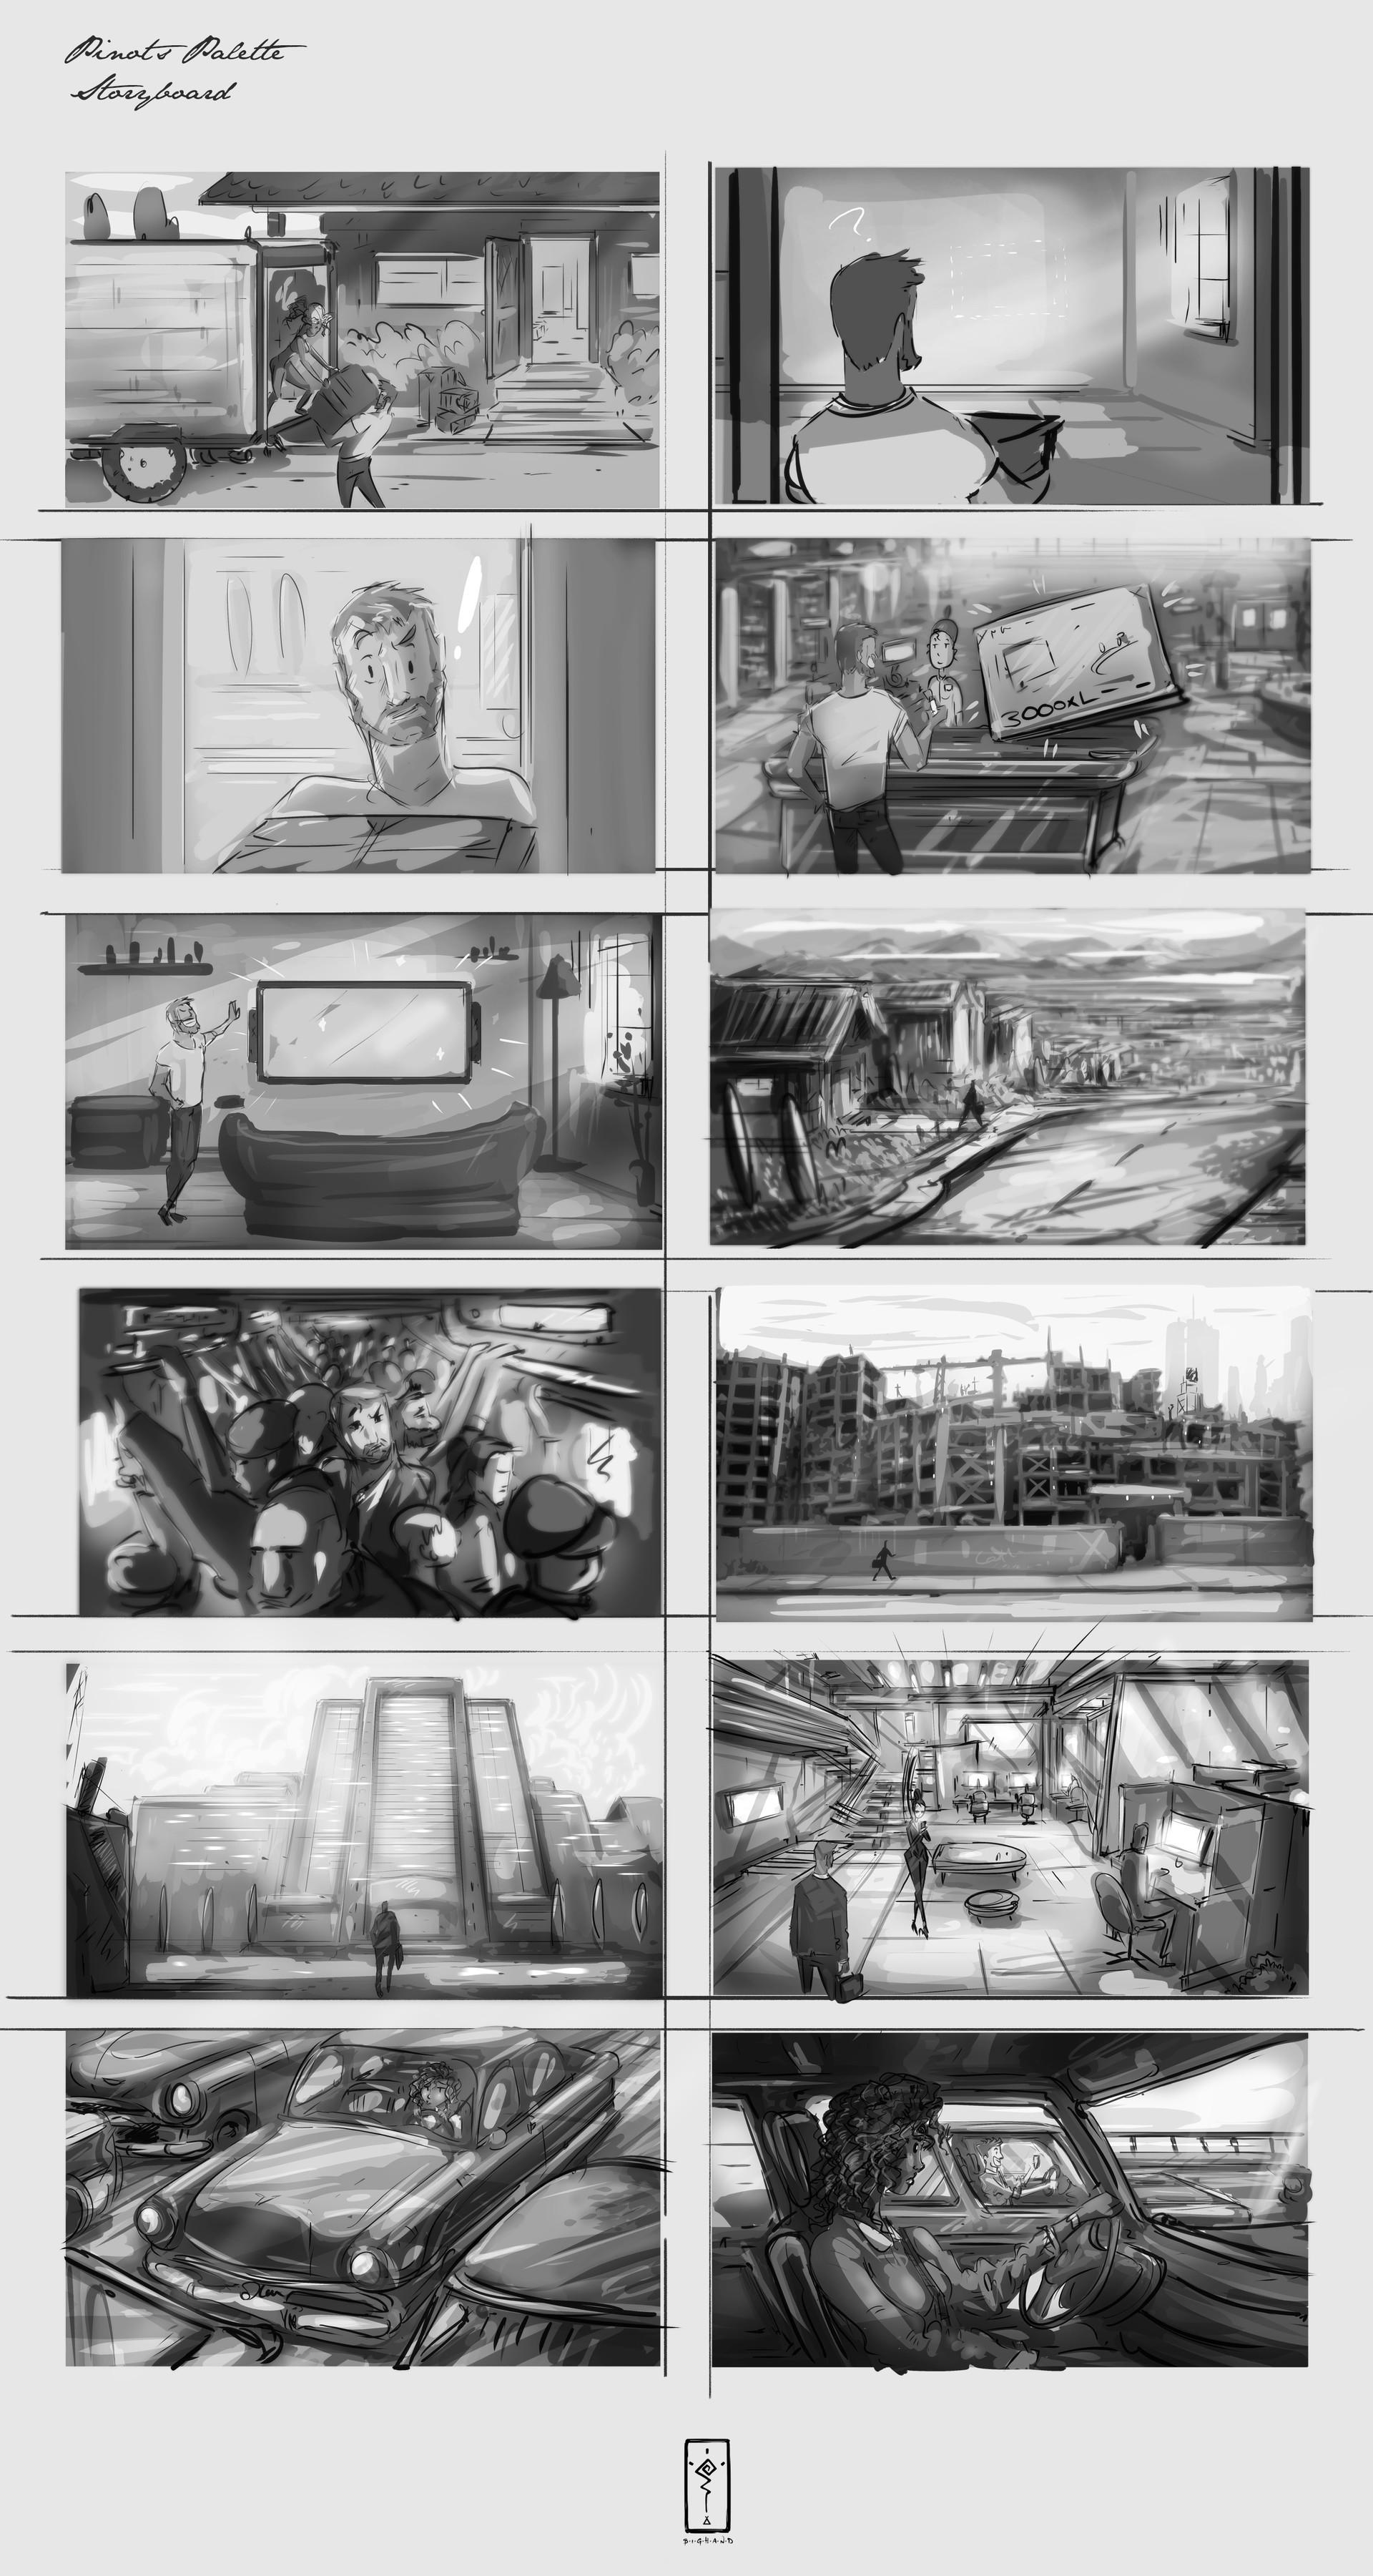 Christian benavides storyboard frames 11 21